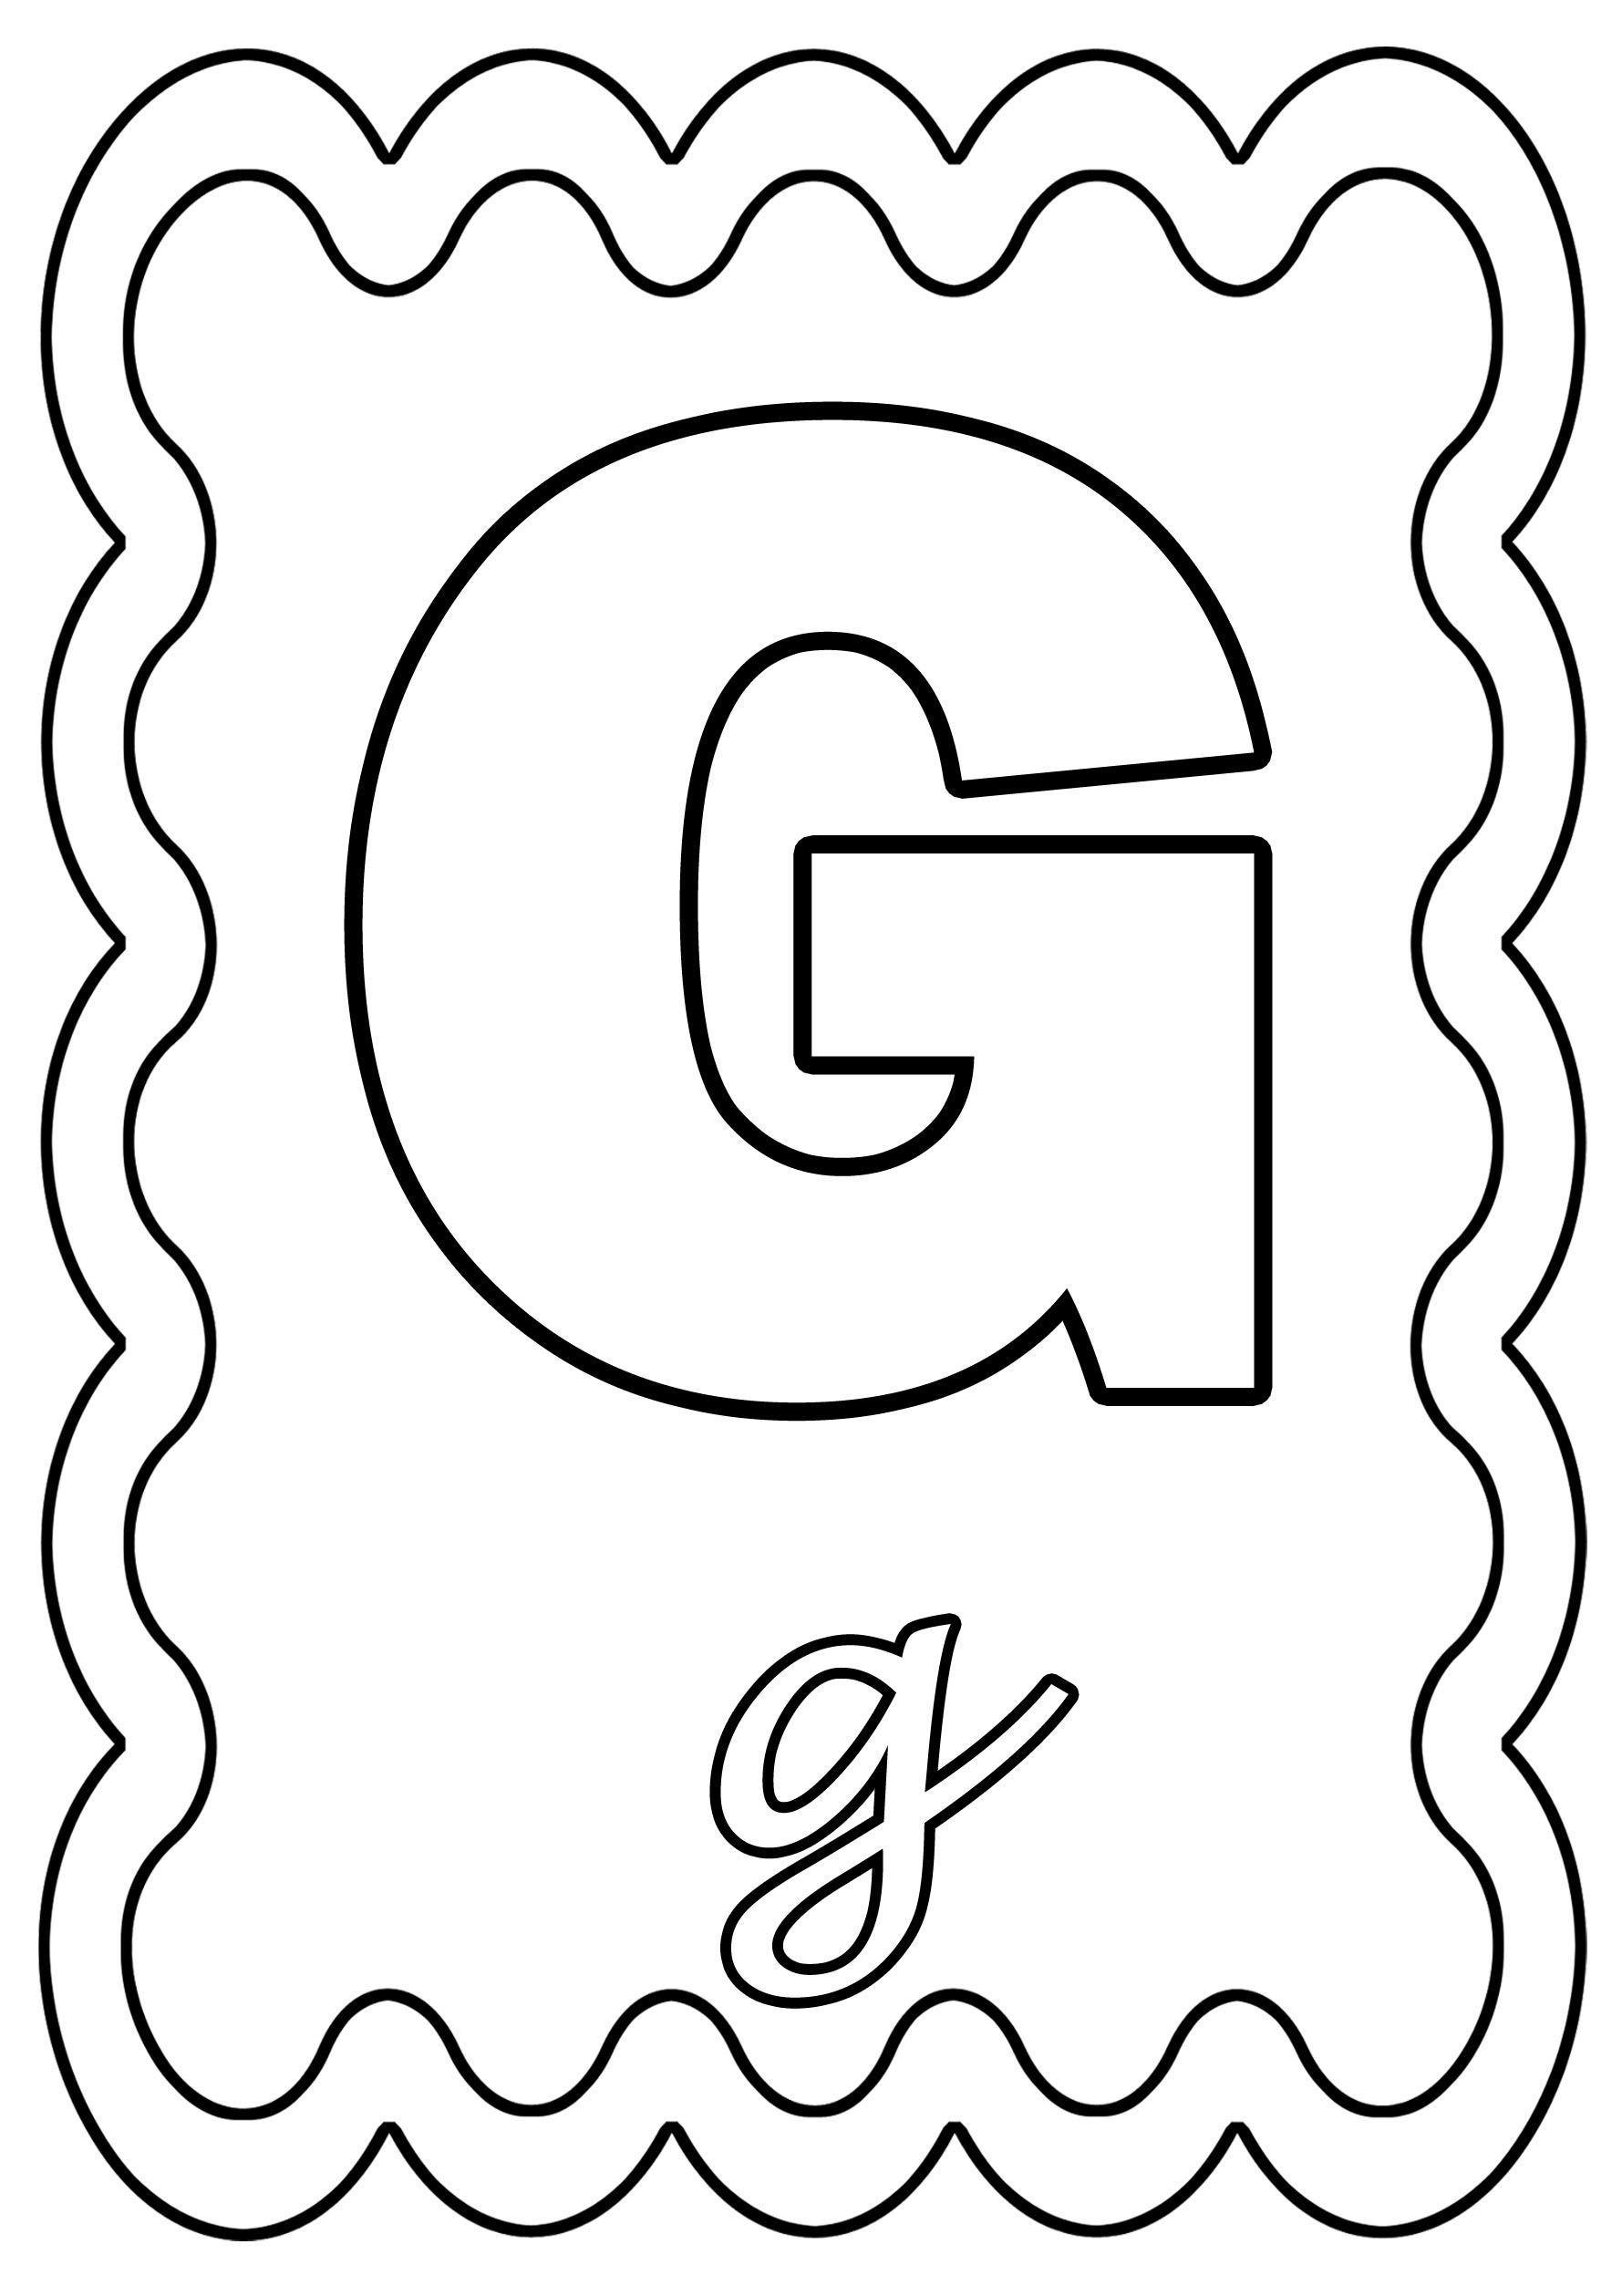 G B Words